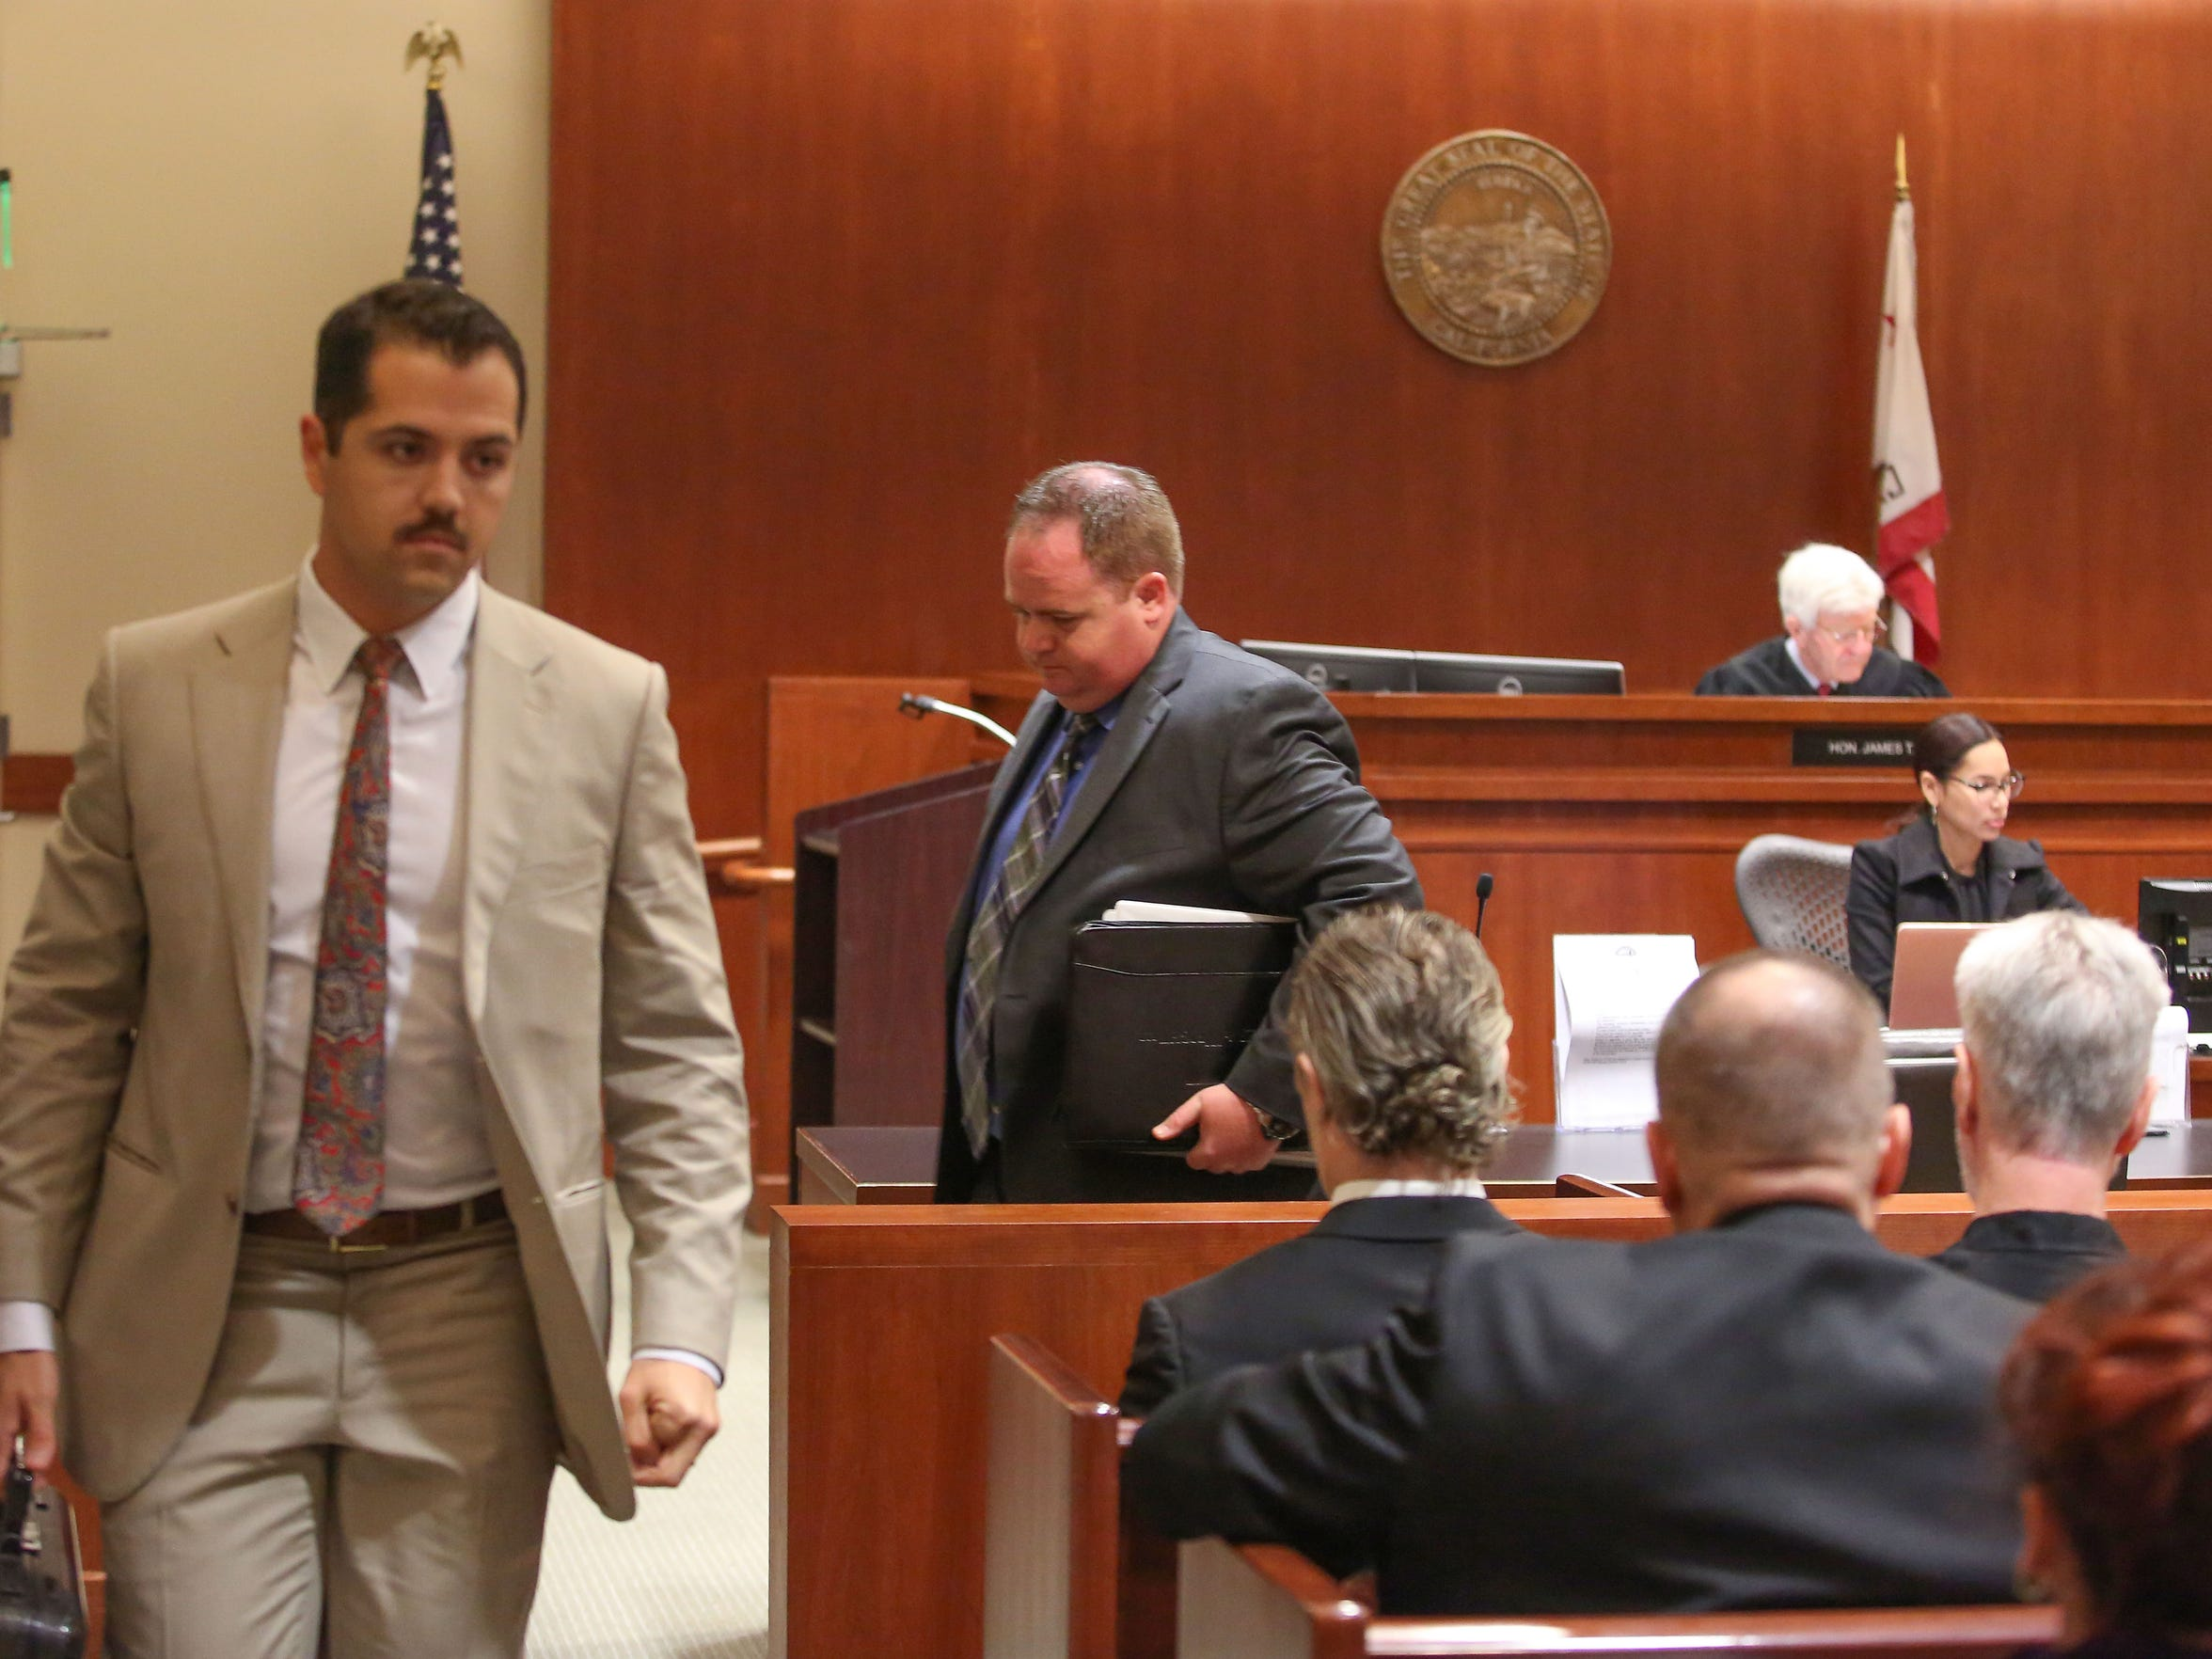 Attorney Shaun Sullivan, left, who is challenging Cesar